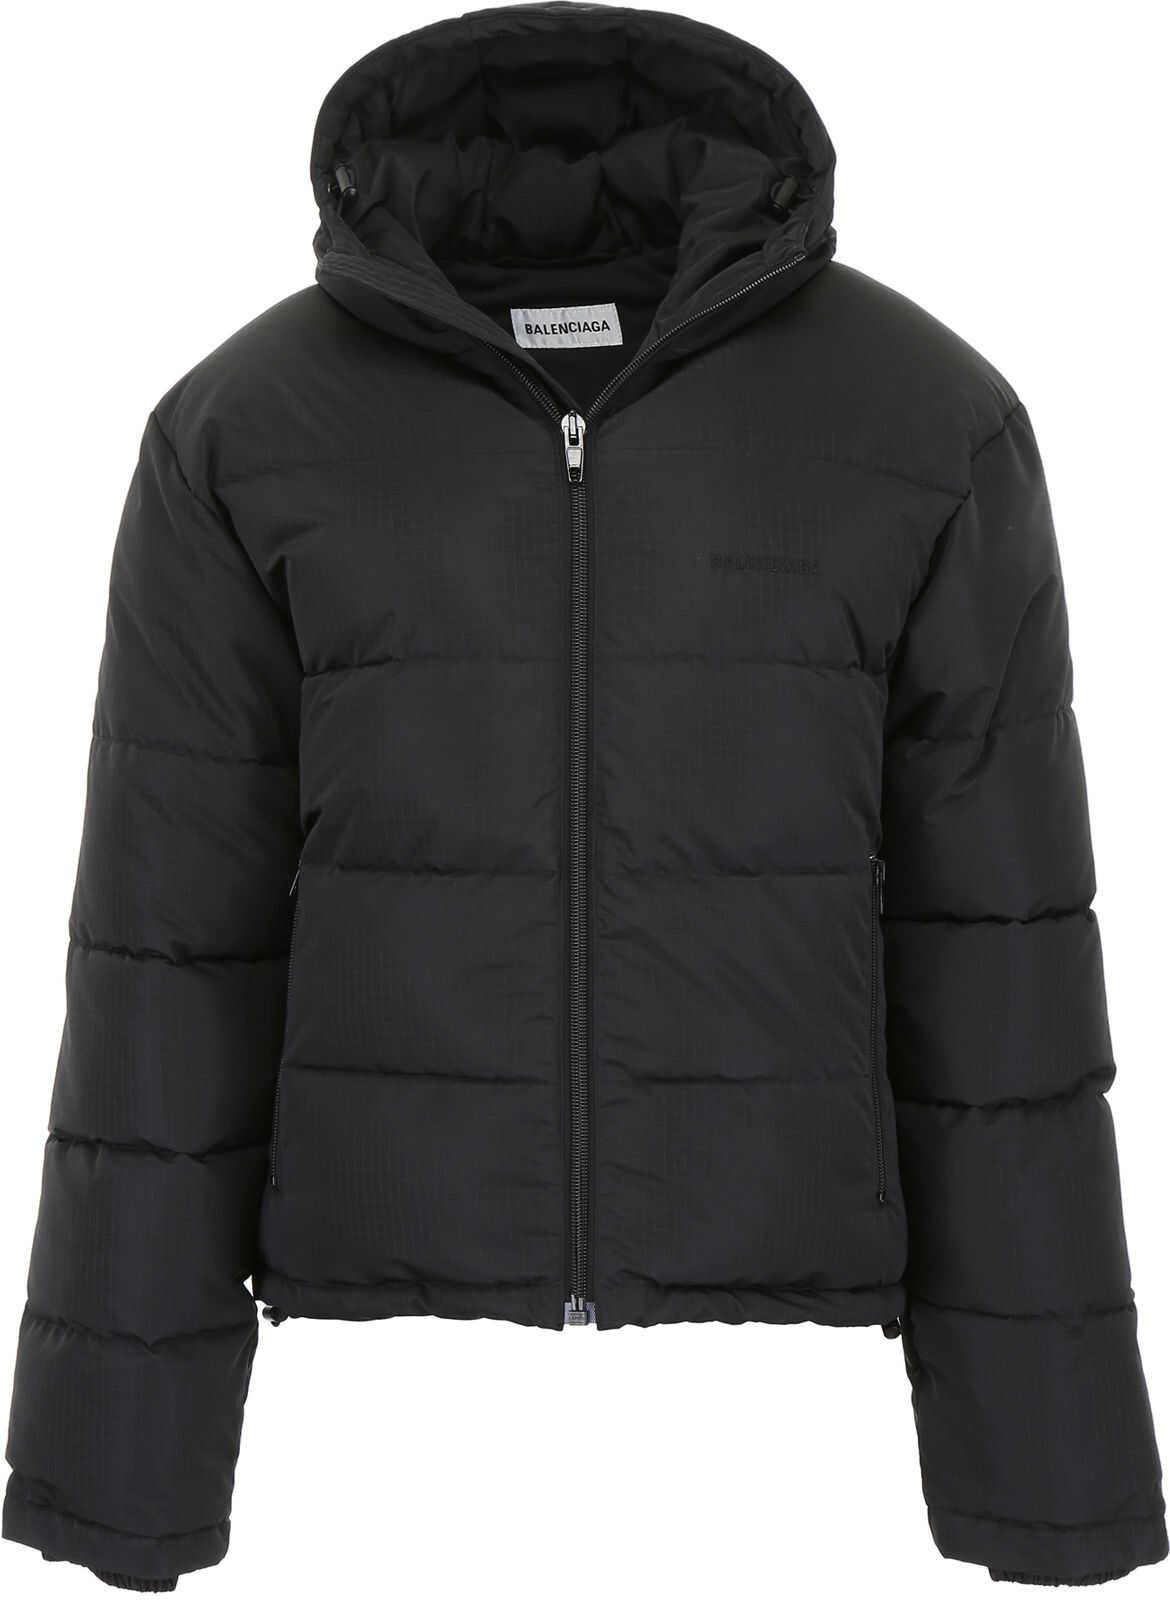 Balenciaga Hooded Puffer Jacket BLACK